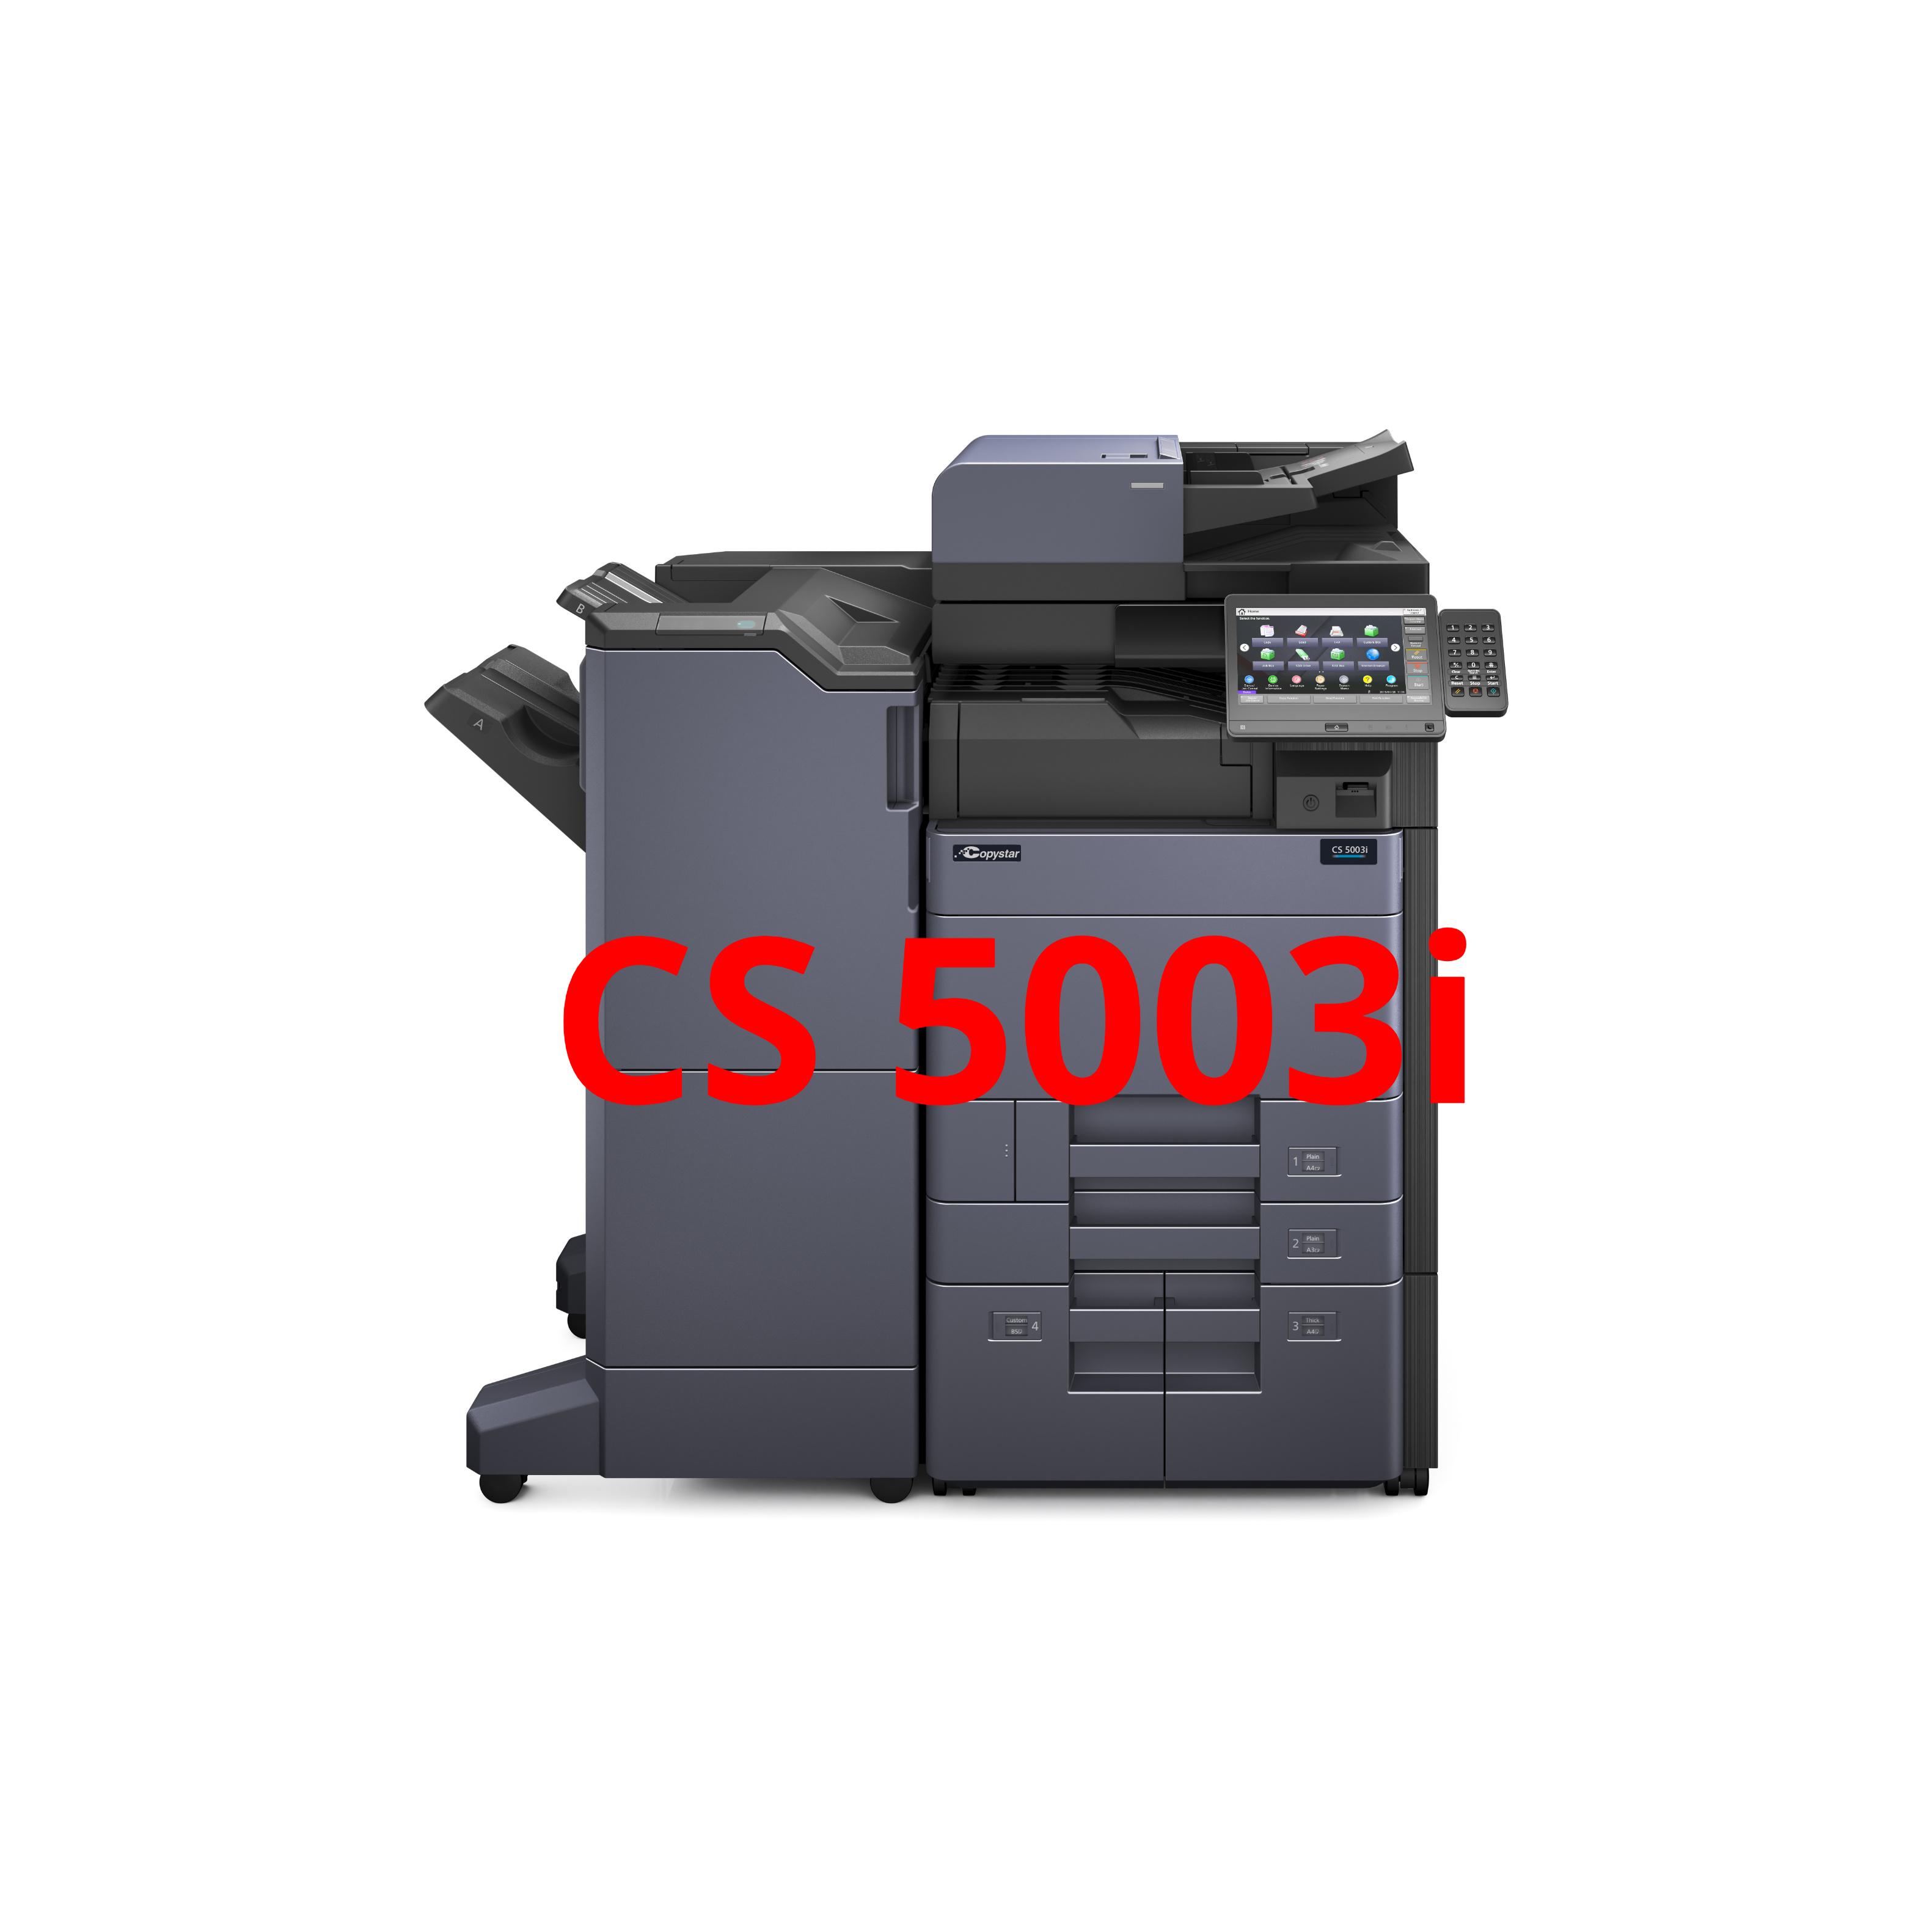 https://0201.nccdn.net/4_2/000/000/060/85f/CS_5003i_Image4-3162x3162.jpg